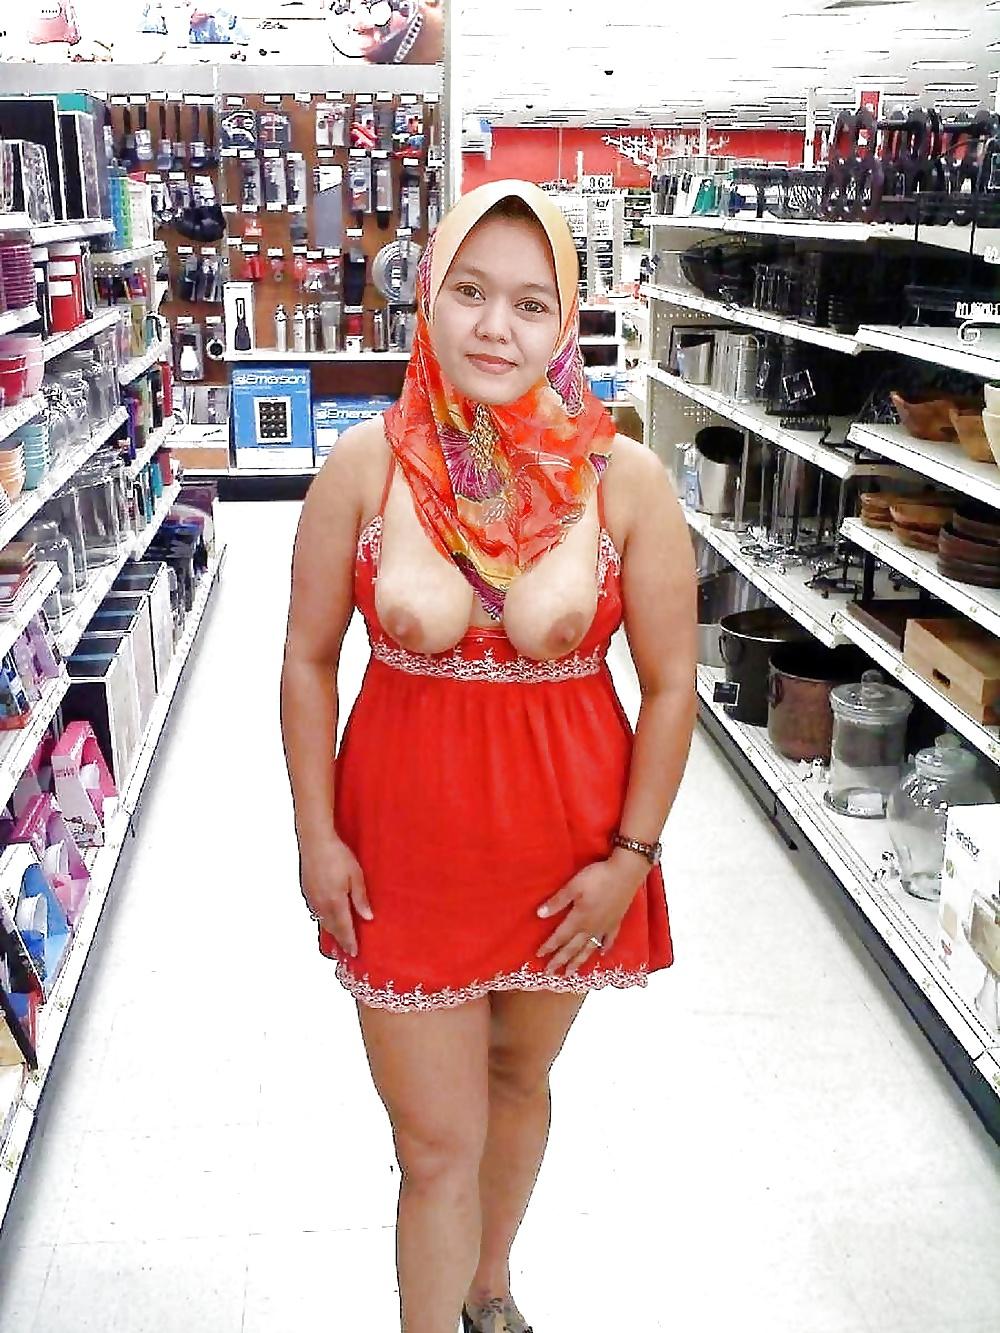 amateur-tits-shopping